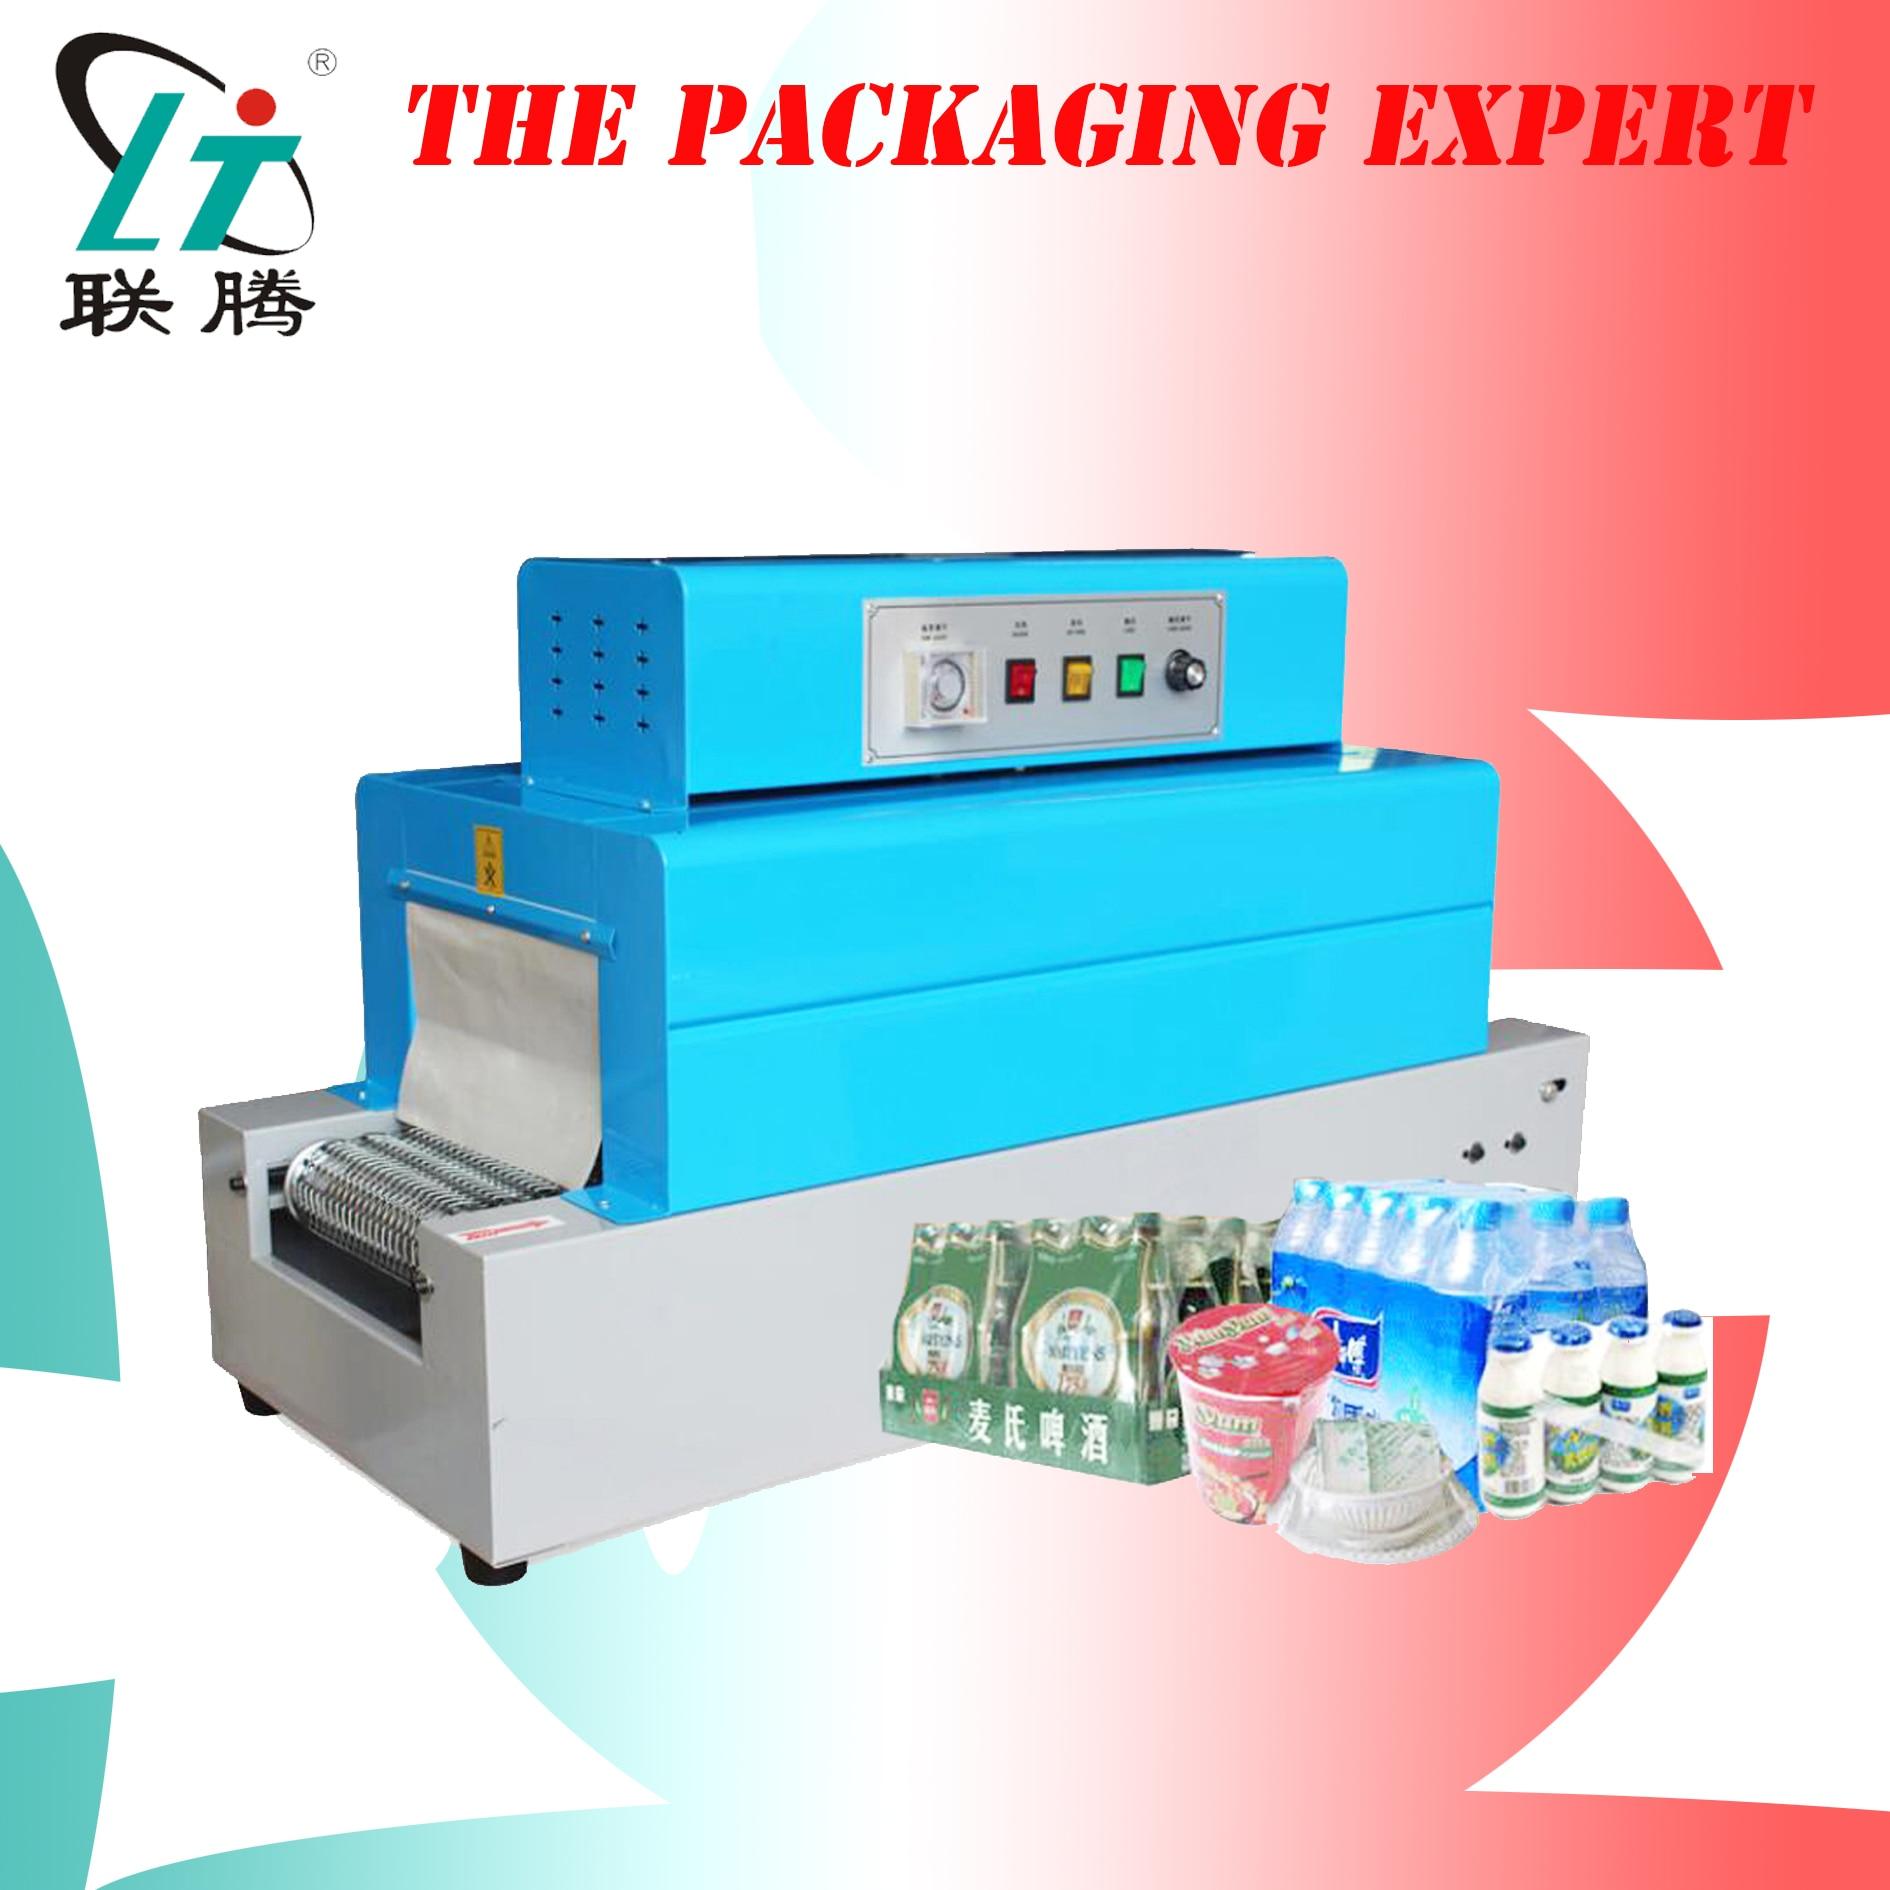 BS260 Thermal Film Wrap Shrinking Machine PET PP POF Film Package Infrared Shrinker Packaging Electrical Heating Tunnel Shrink|Vacuum Food Sealers| |  - title=